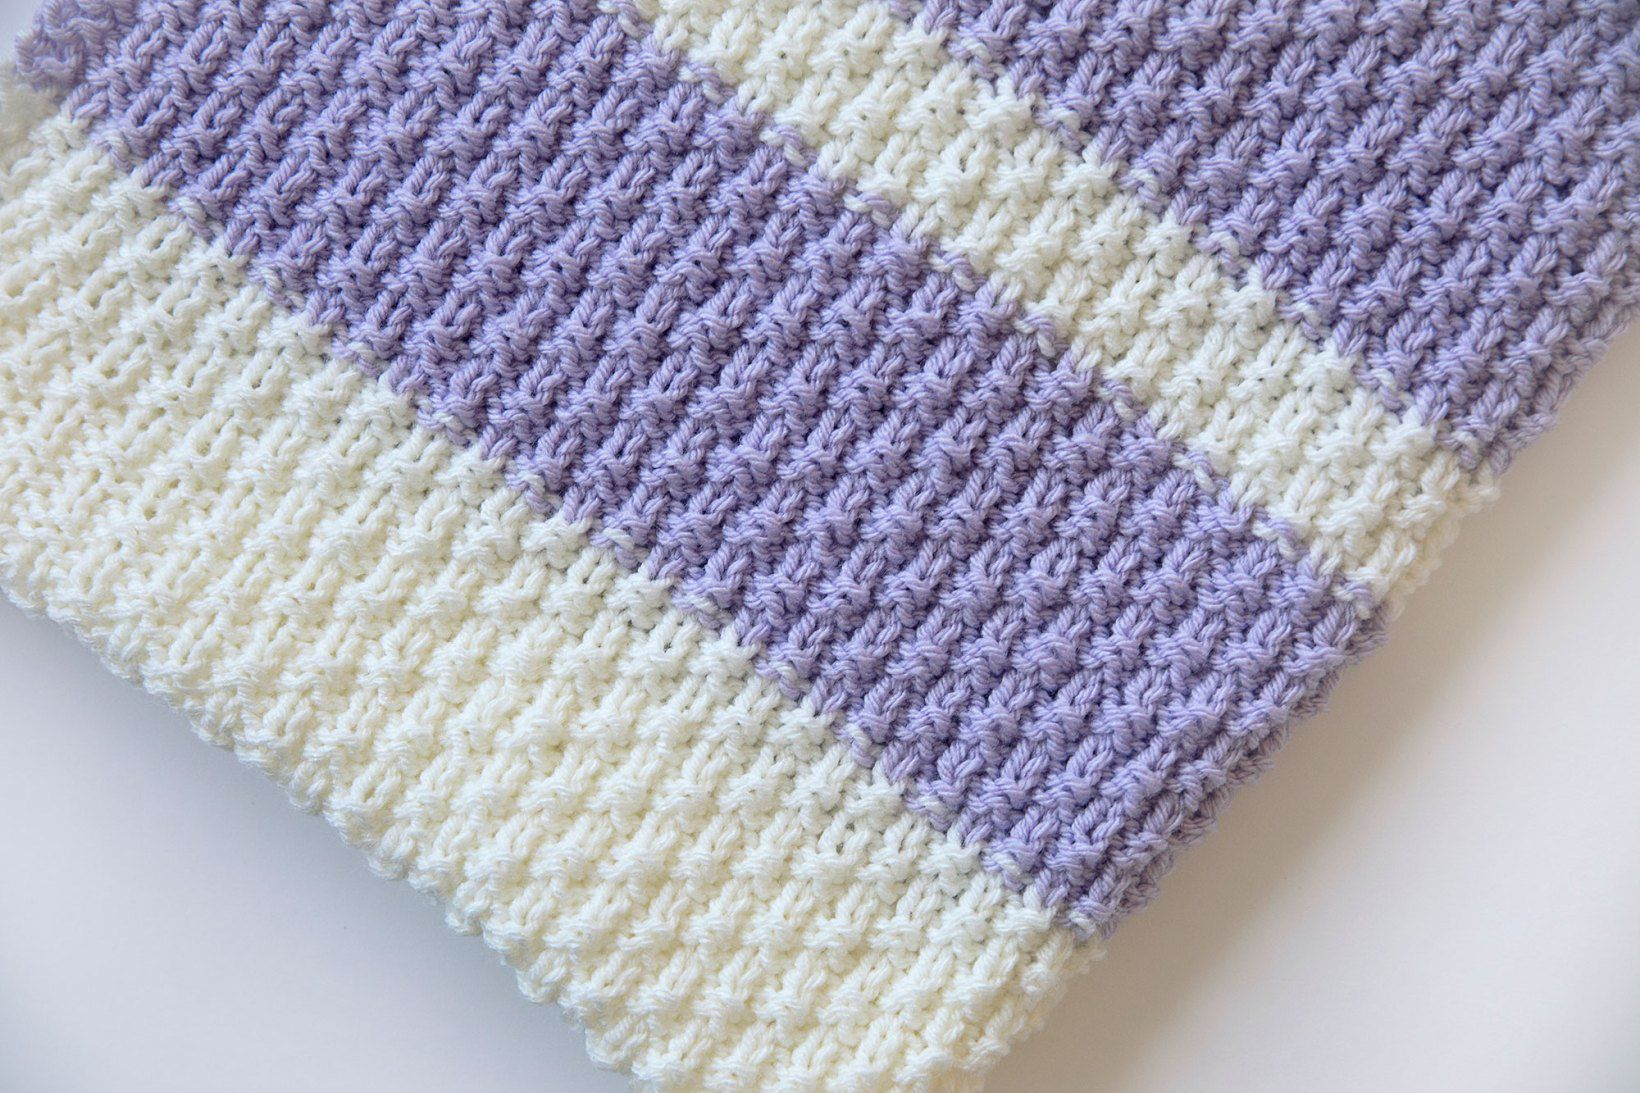 cab4b367b8b9 25 Easy Knitting Patterns for Beginners